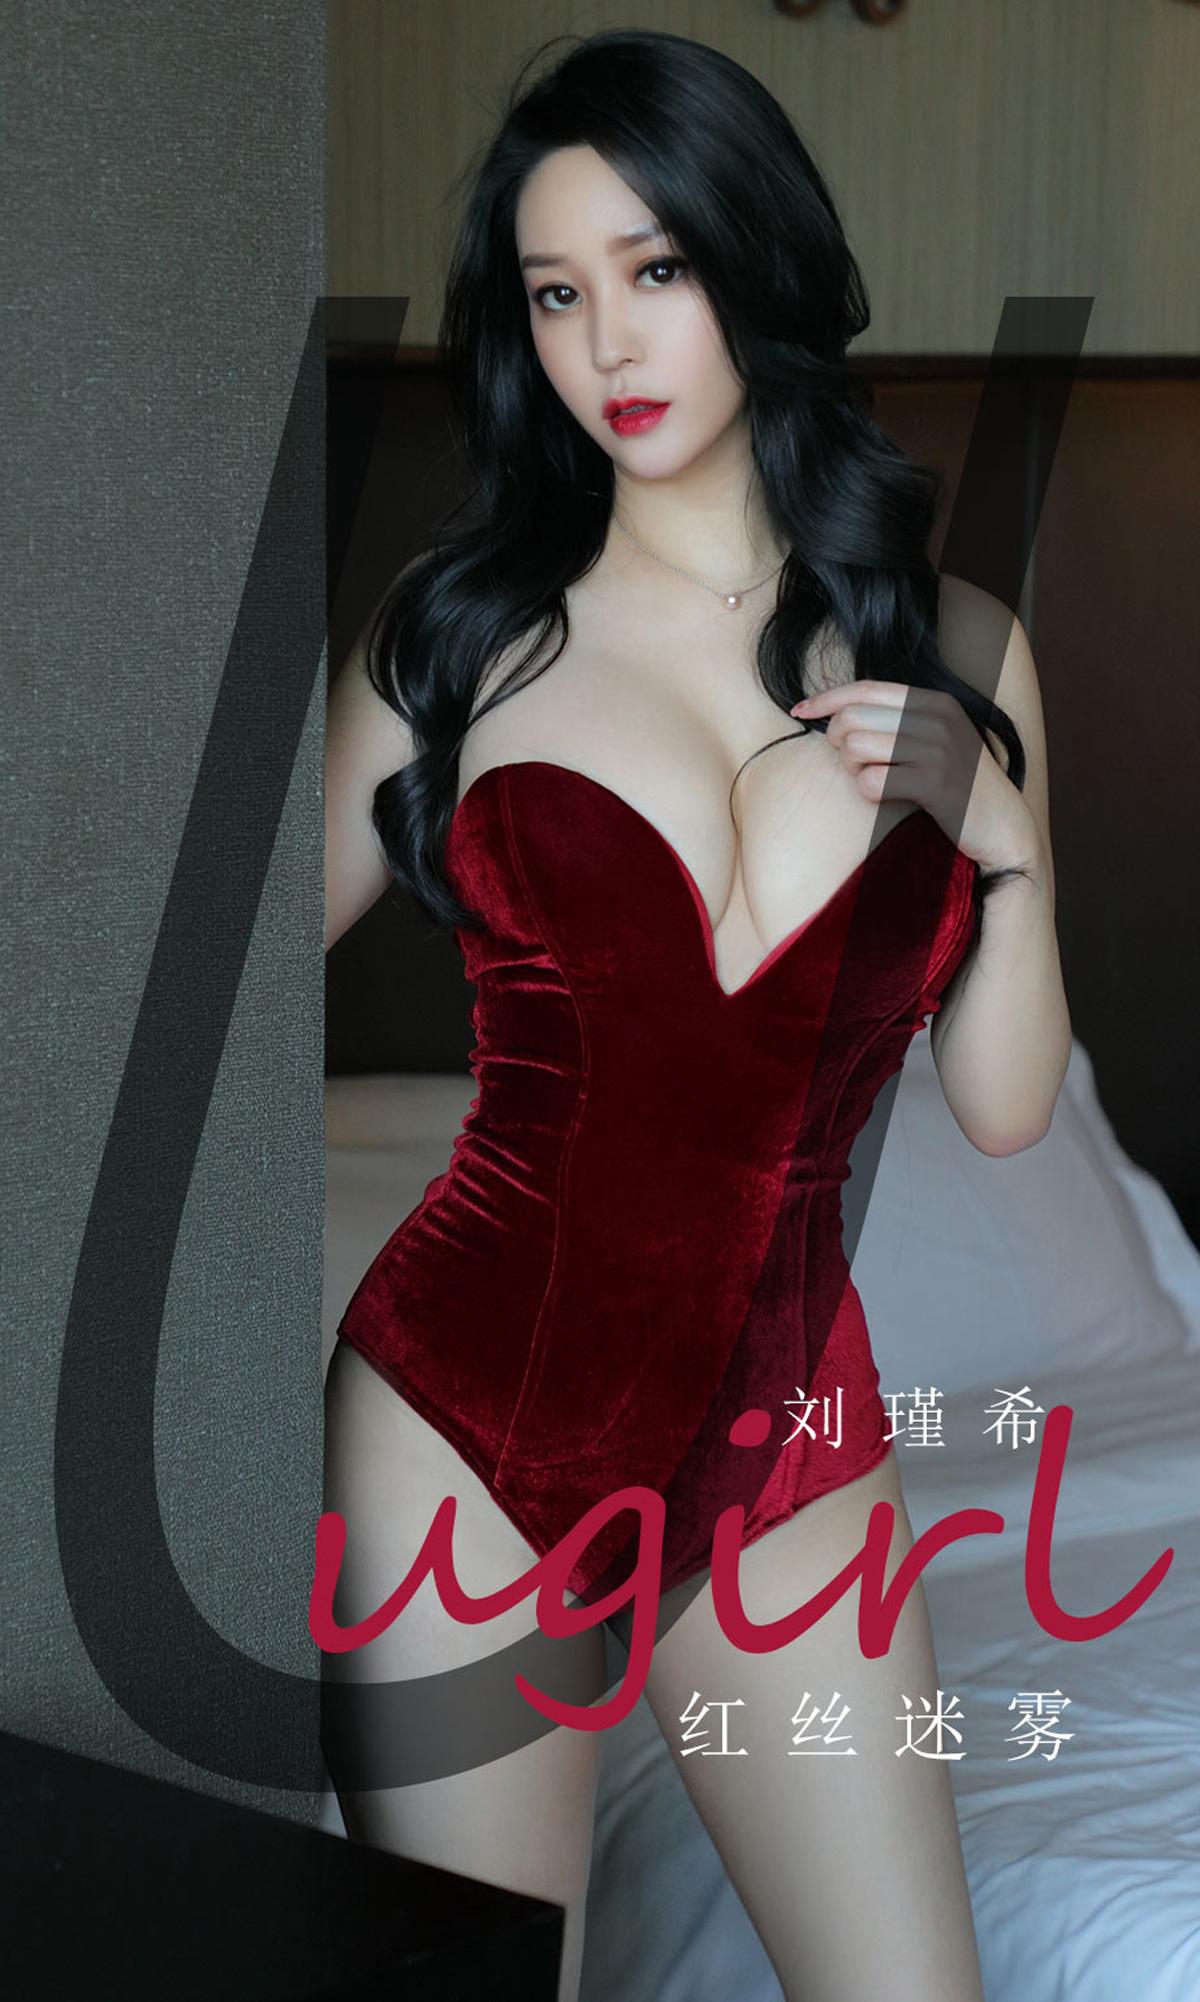 [Ugirls尤果网]爱尤物 2020.05.29 No.1832 刘瑾希 轻丝迷雾[/33MB]